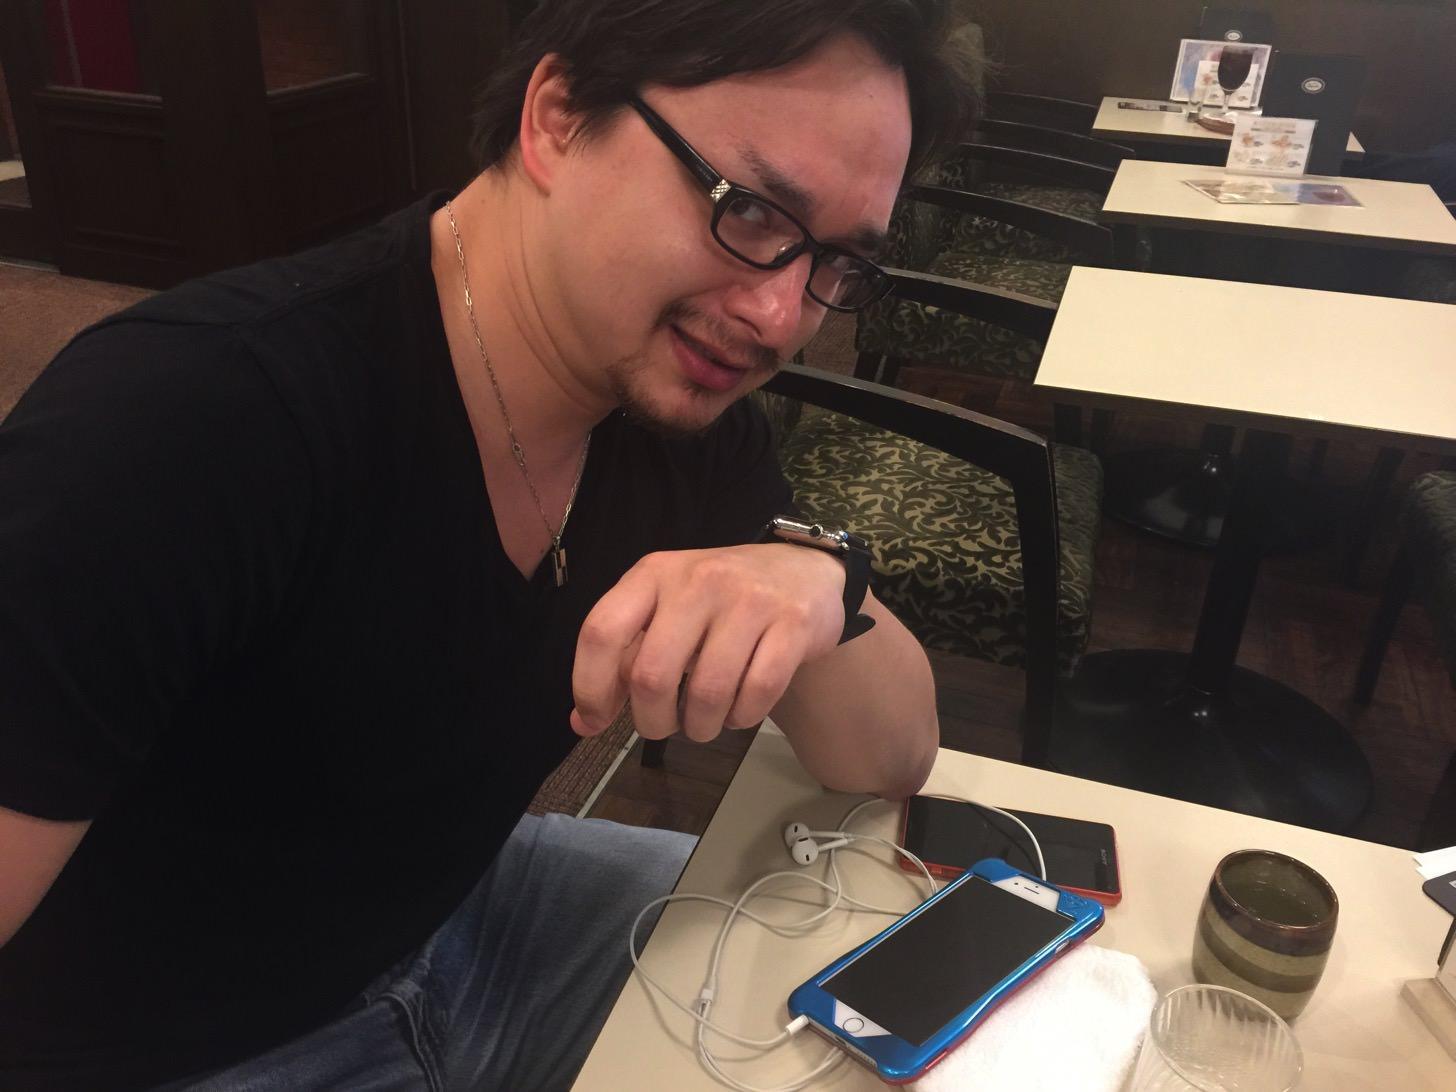 Apple Watchで電話するマックス氏